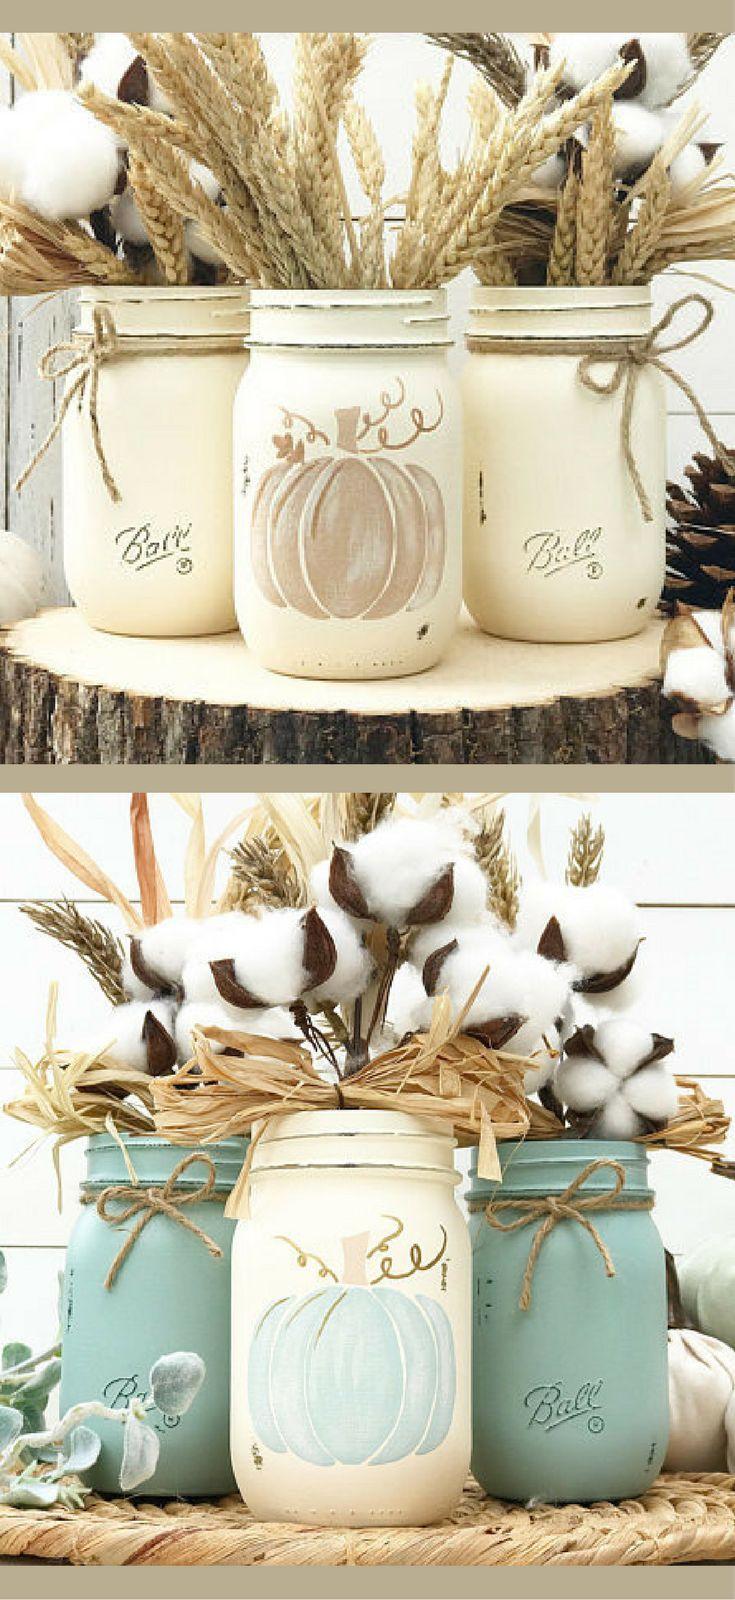 Set of 3 pumpkin Mason Jars, aqua blue or natural colors, Blue fall decor, Pumpkin Trio, Autumn Decor, Home Decor, Fall Decor, Centerpiece, Fall Wedding, Farmhouse Thanksgiving, Fall, Shabby Chic, Blue Pumpkin decor #affiliatelink #ad